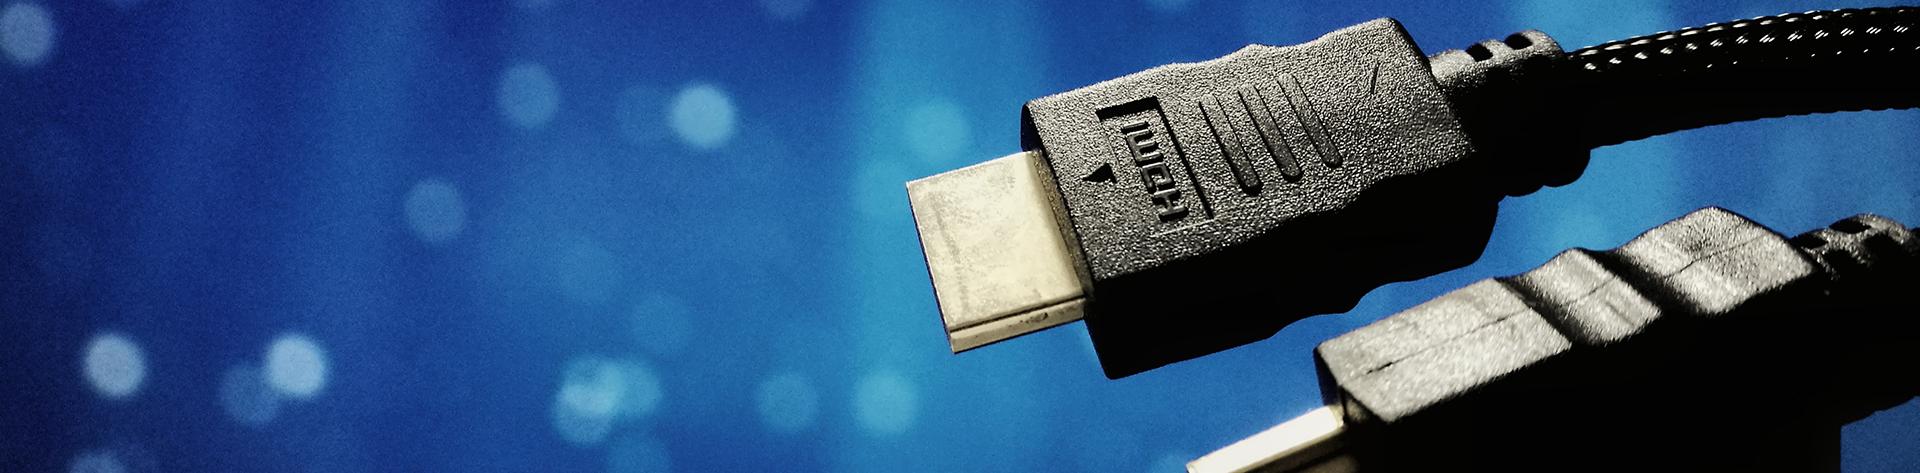 file-utility-connectorbg